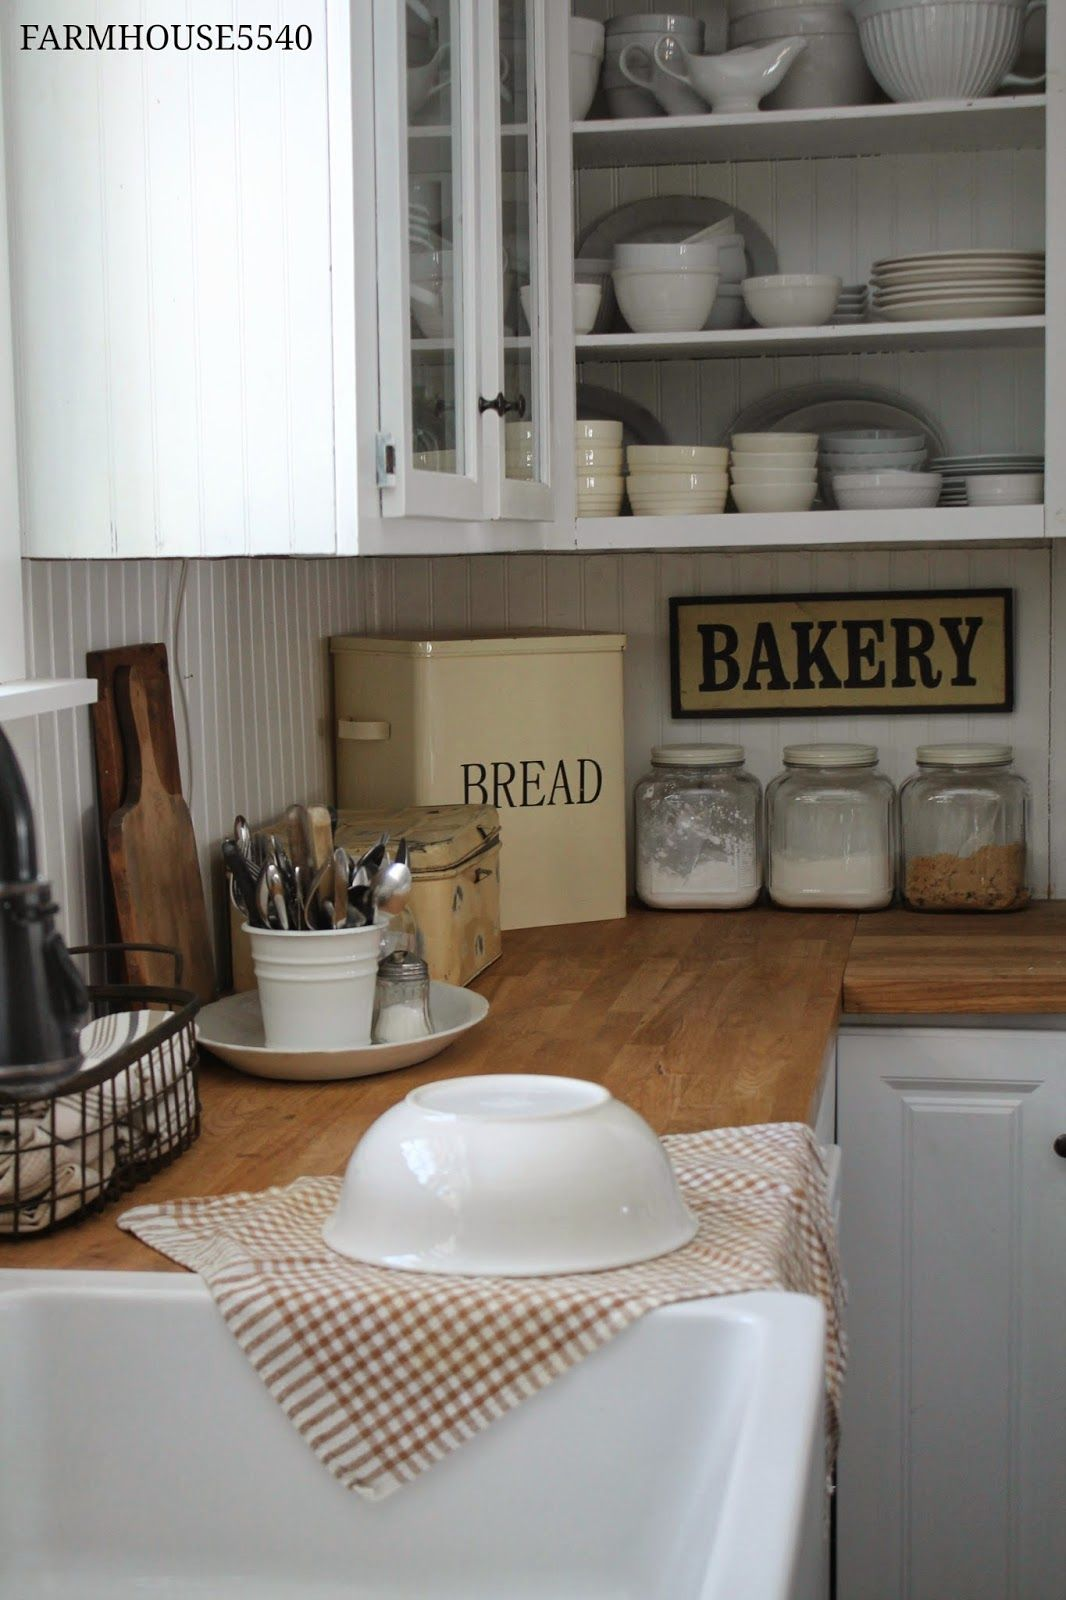 Farmhouse 5540 Family Room Part Three Kitchen Inspirations Home Kitchens Kitchen Decor